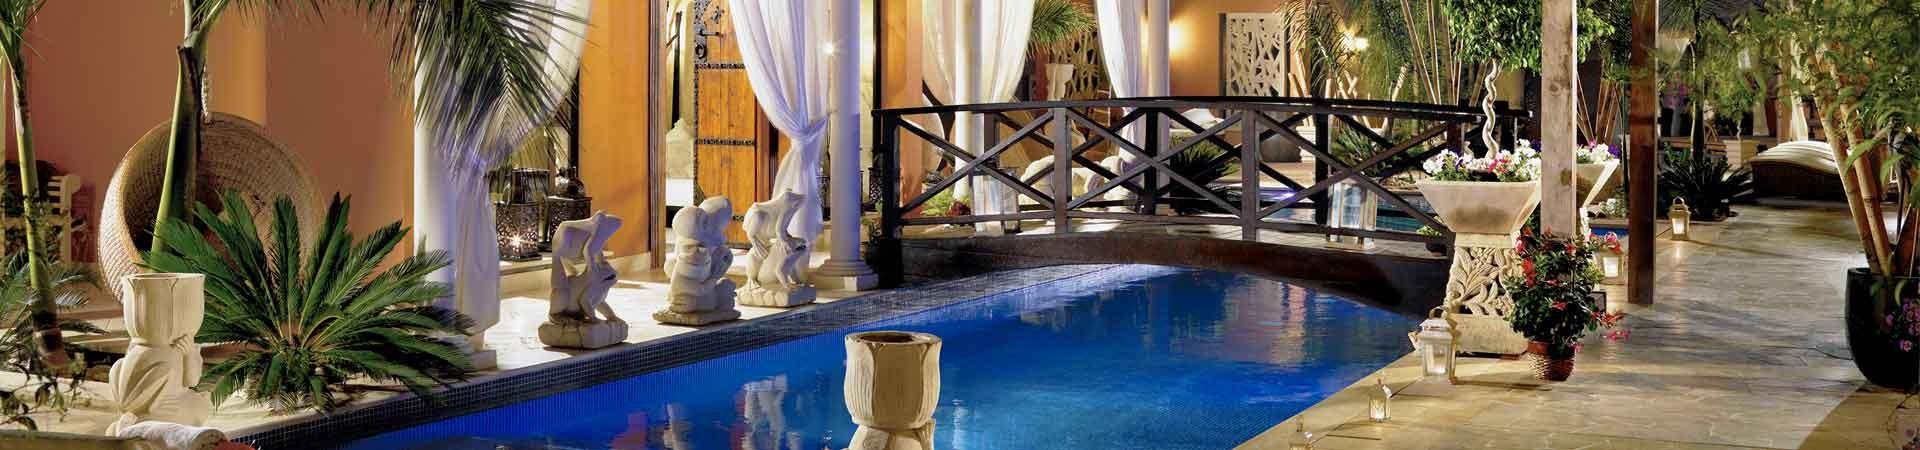 https://www.goodmorningtenerife.com/wp-content/uploads/2015/01/01_slide_hotel-Royal-Garden-Villas-Spa-1920x450.jpg